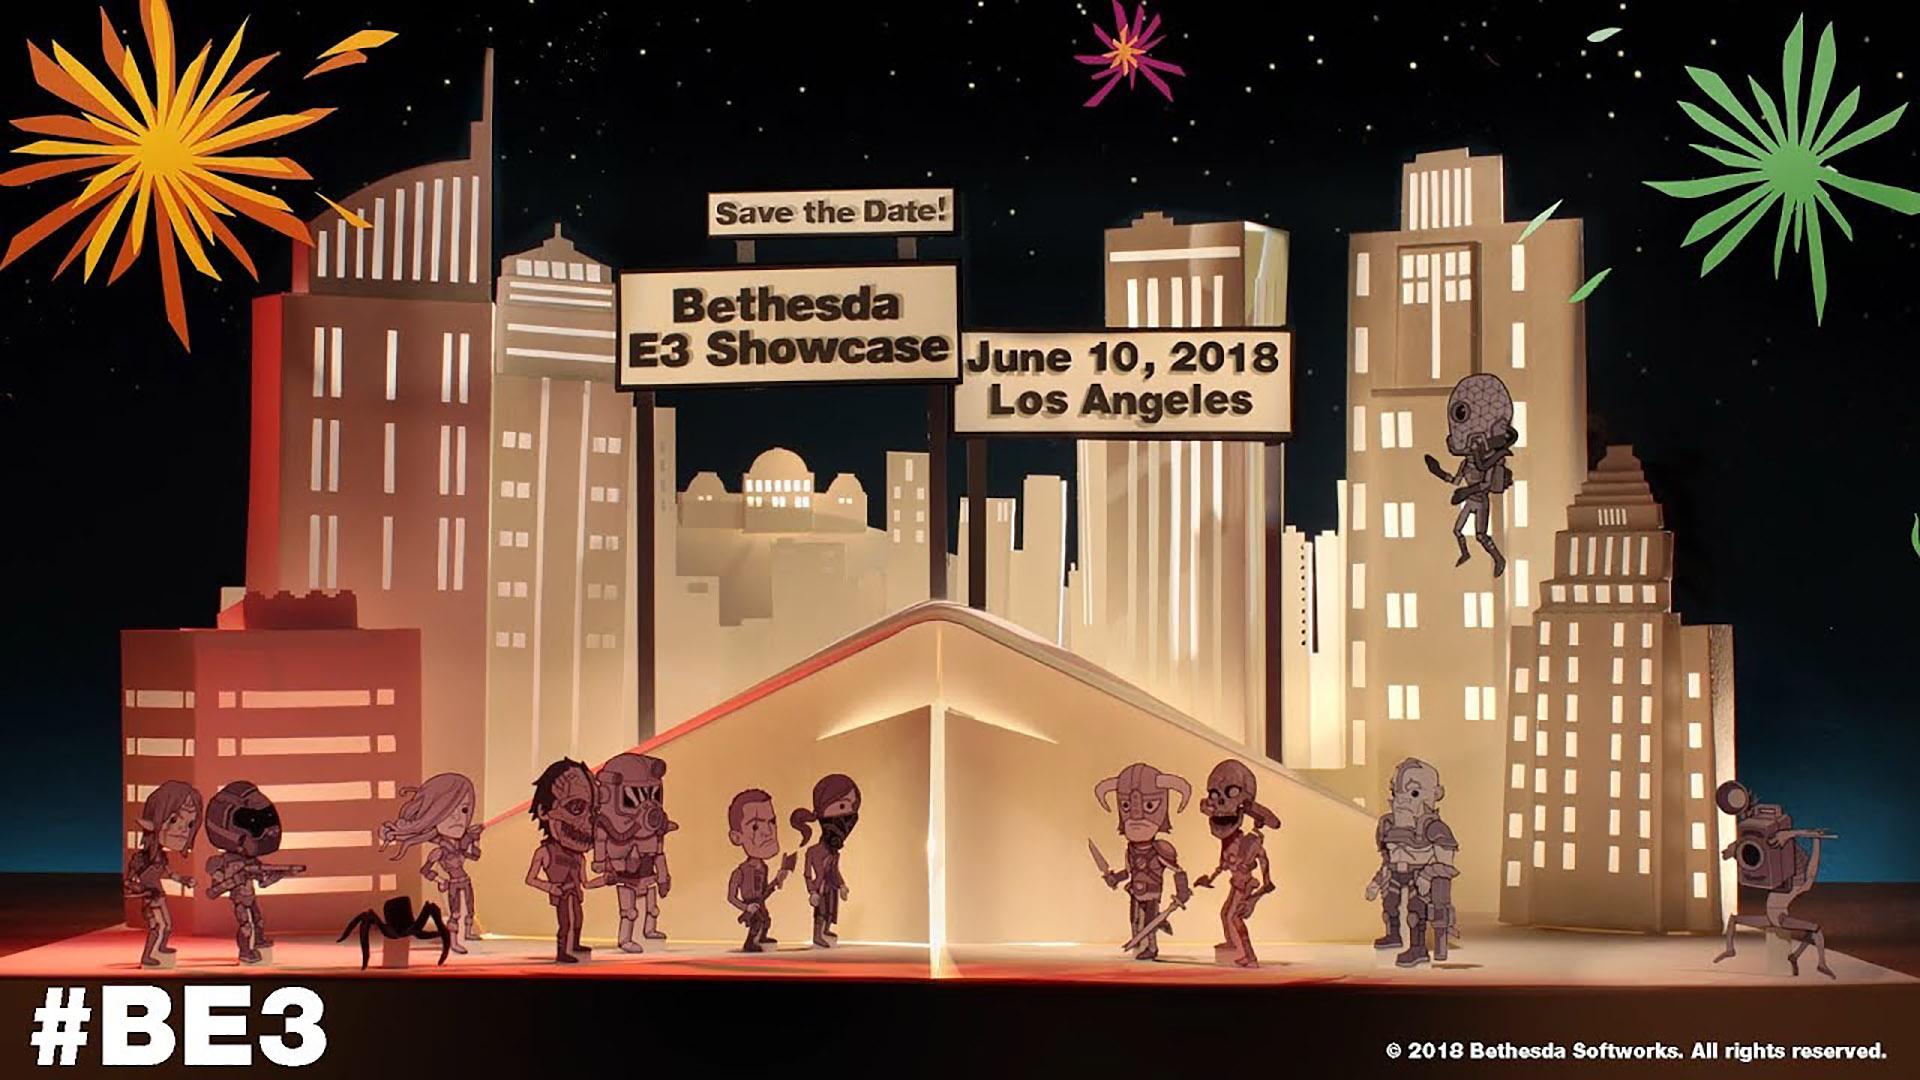 Bethesda-E3 2018